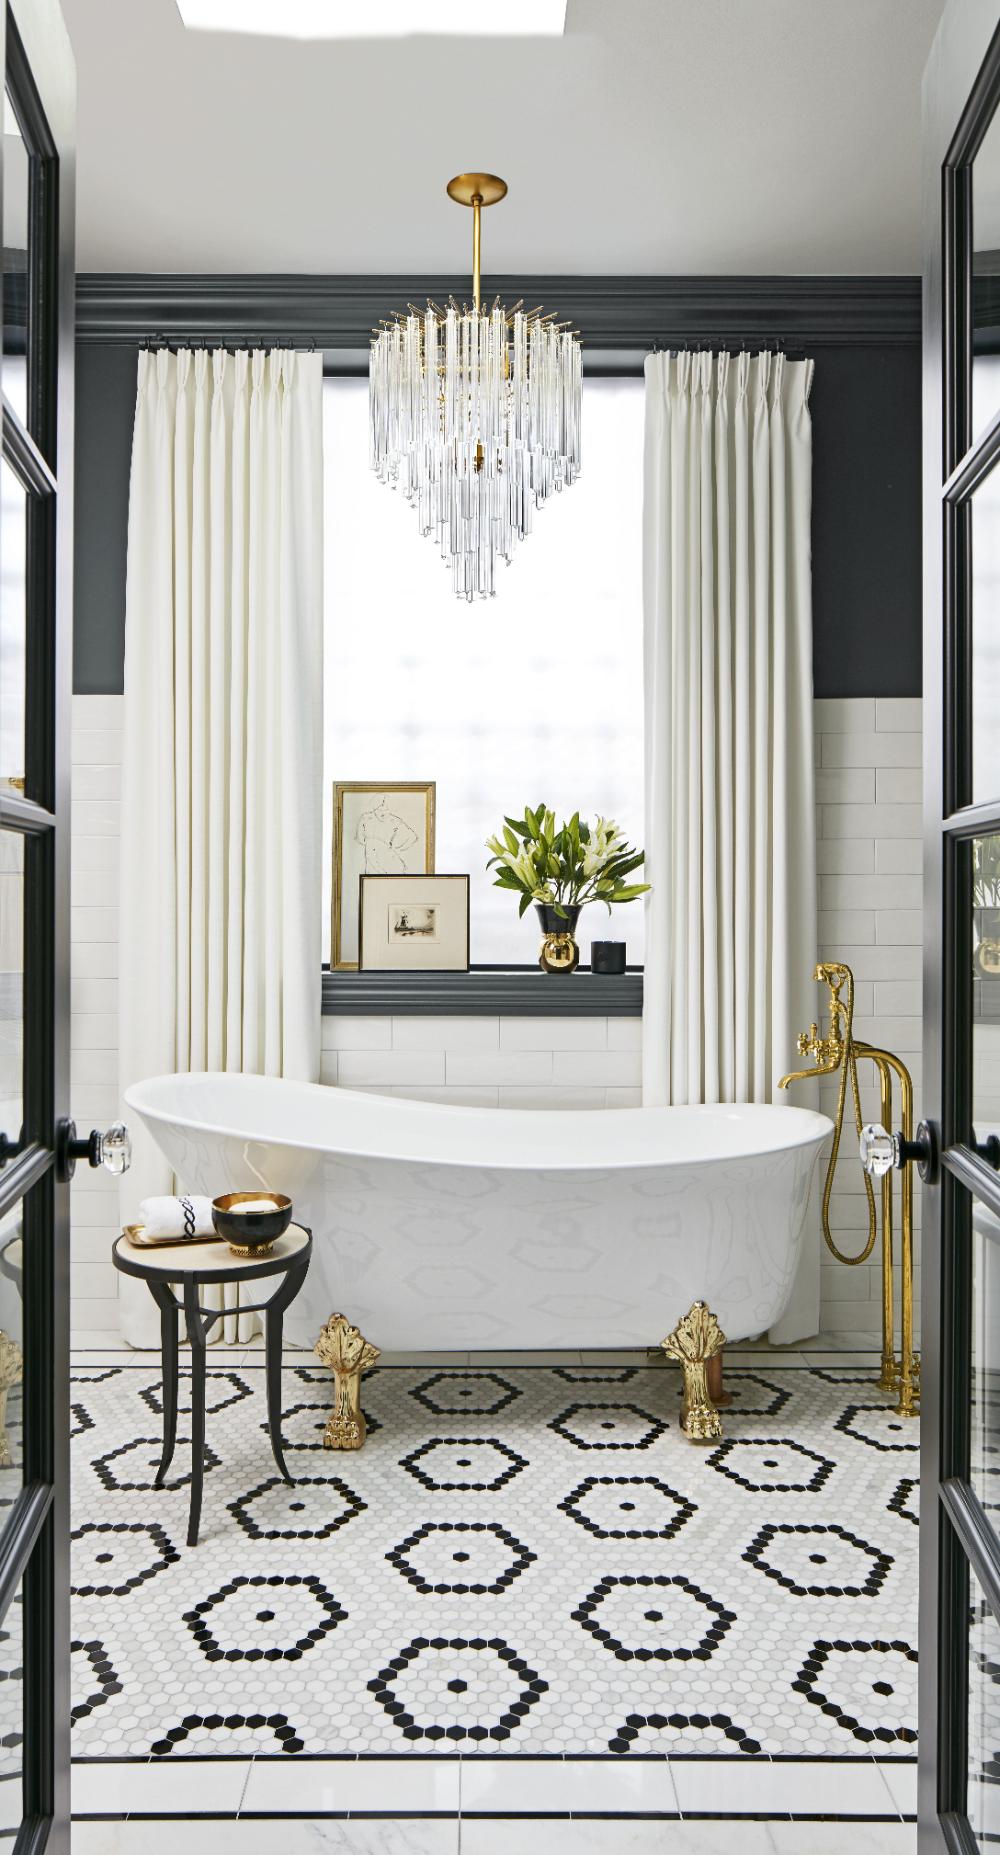 Black And Tan Bathroom Decor In 2020 Bathroom Tile Designs